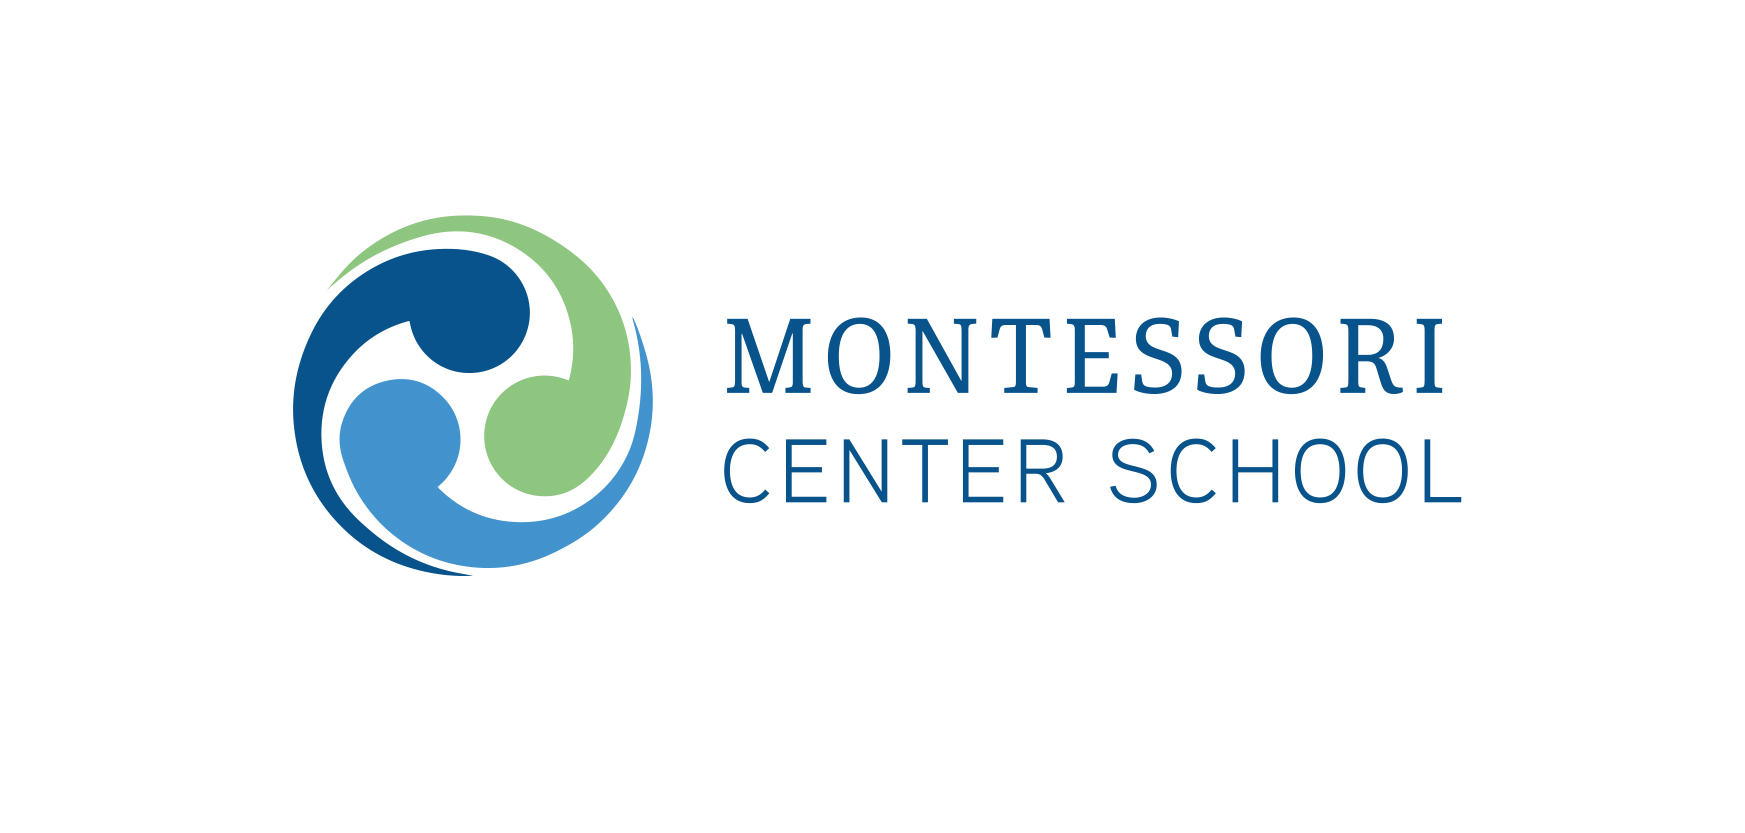 Montessori Center School